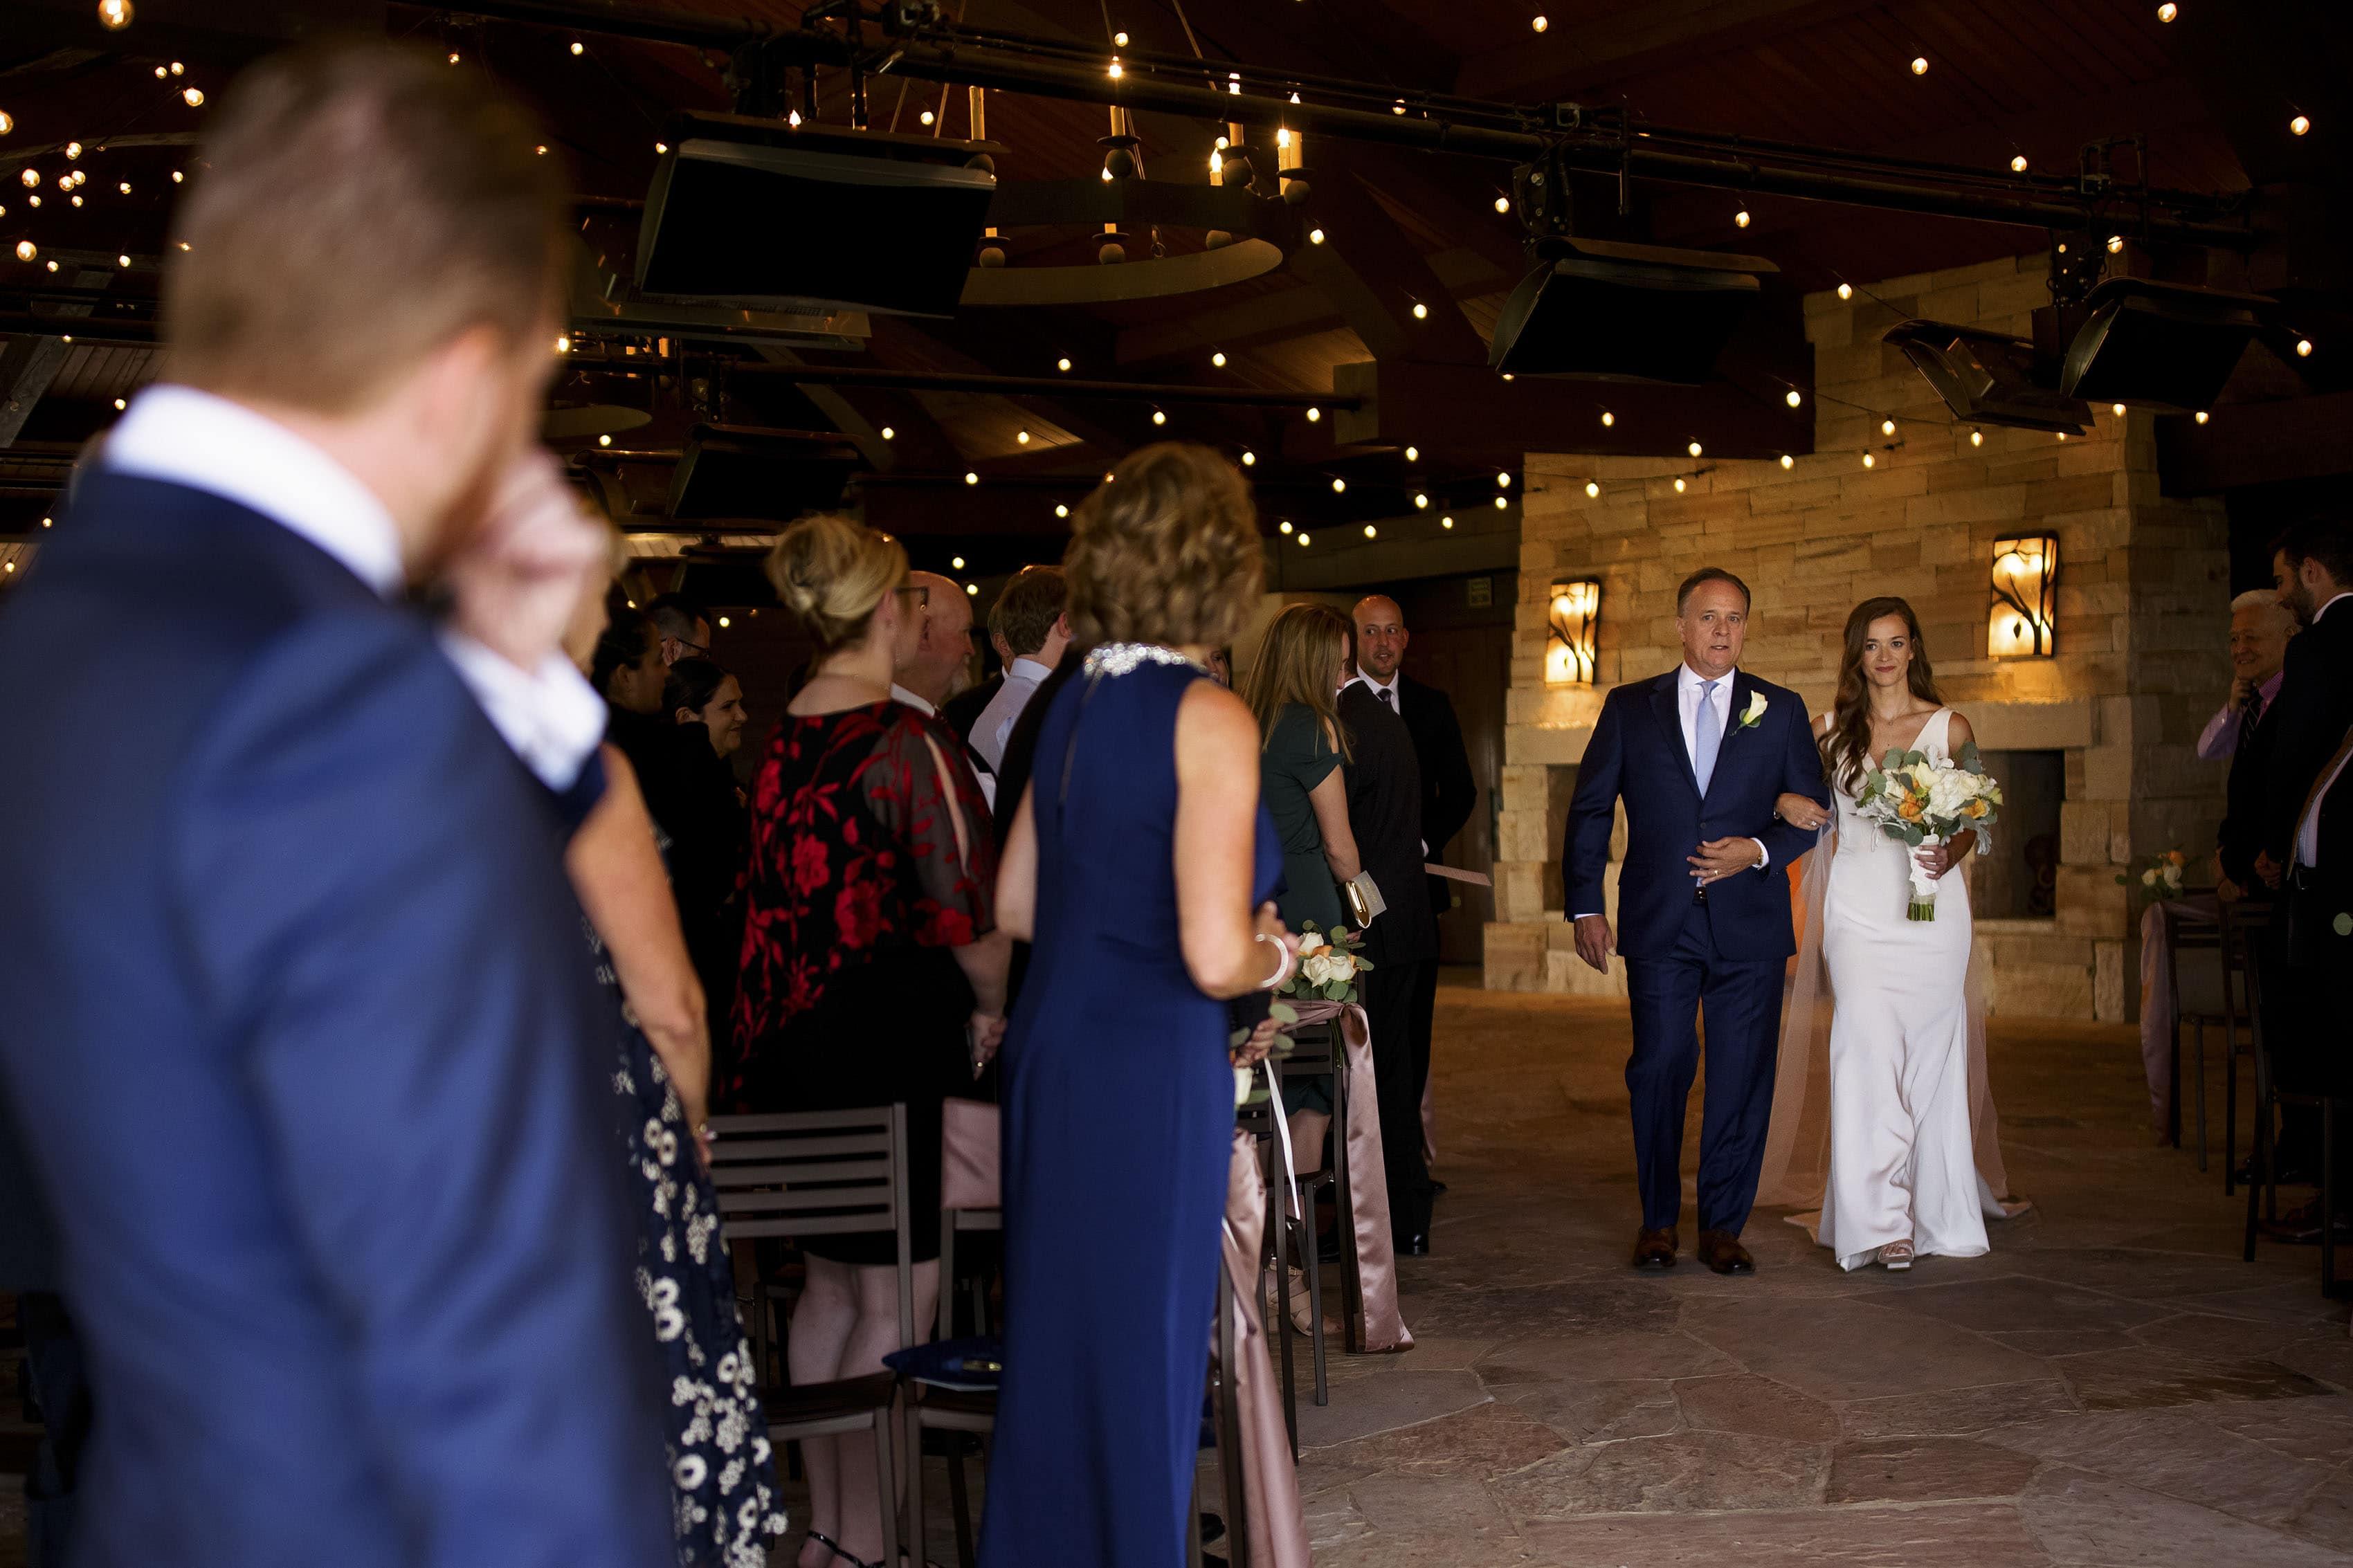 The bride walks down the aisle at Sanctuary Golf Course